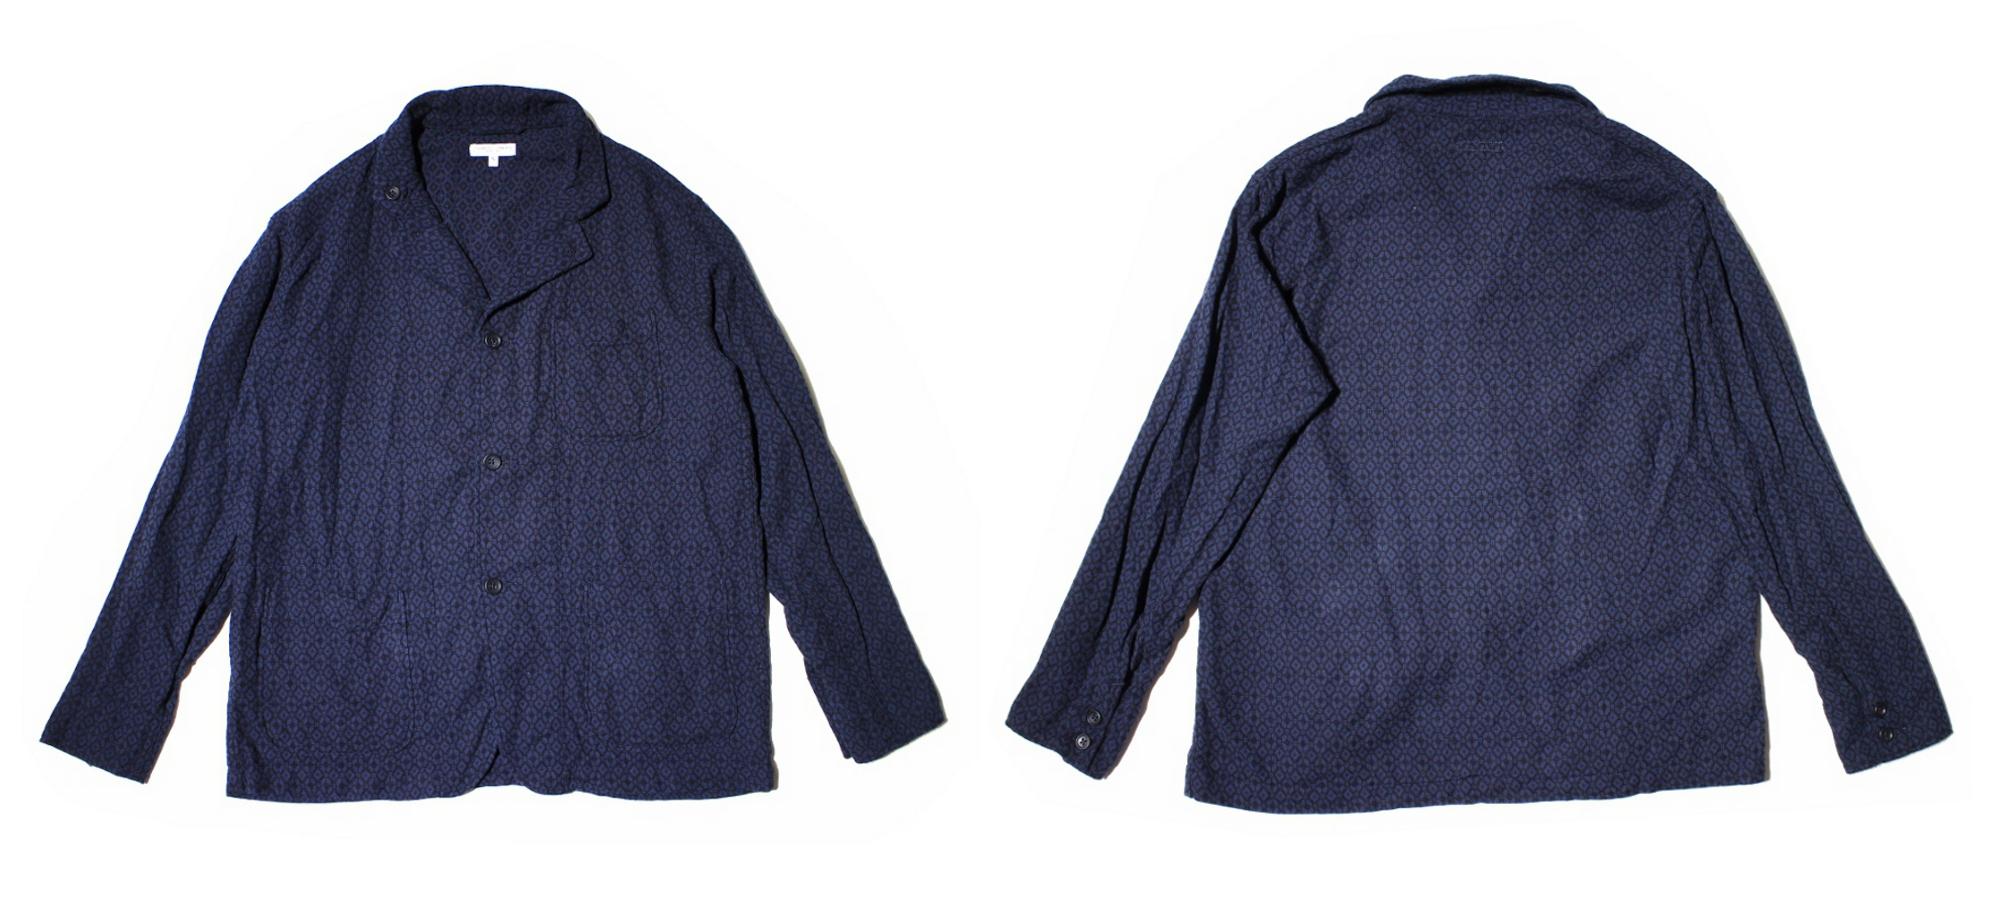 Engineerd Garments